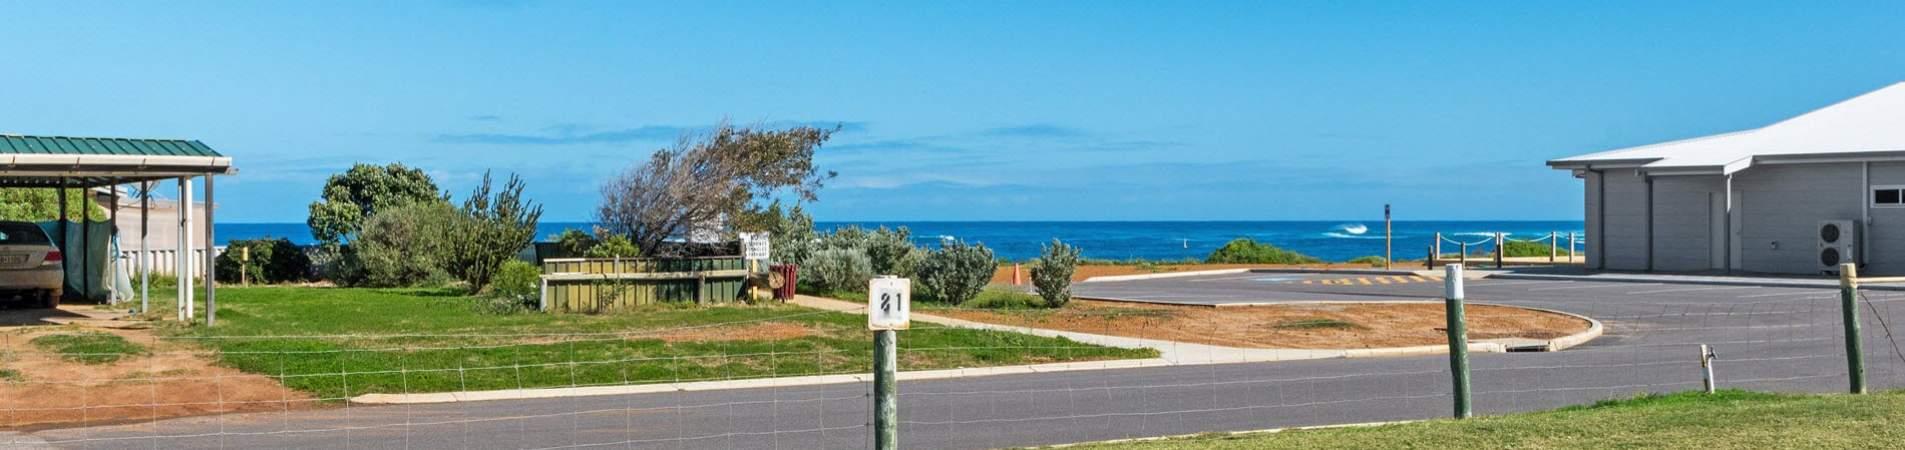 horrocks beach caravan park - banner 3